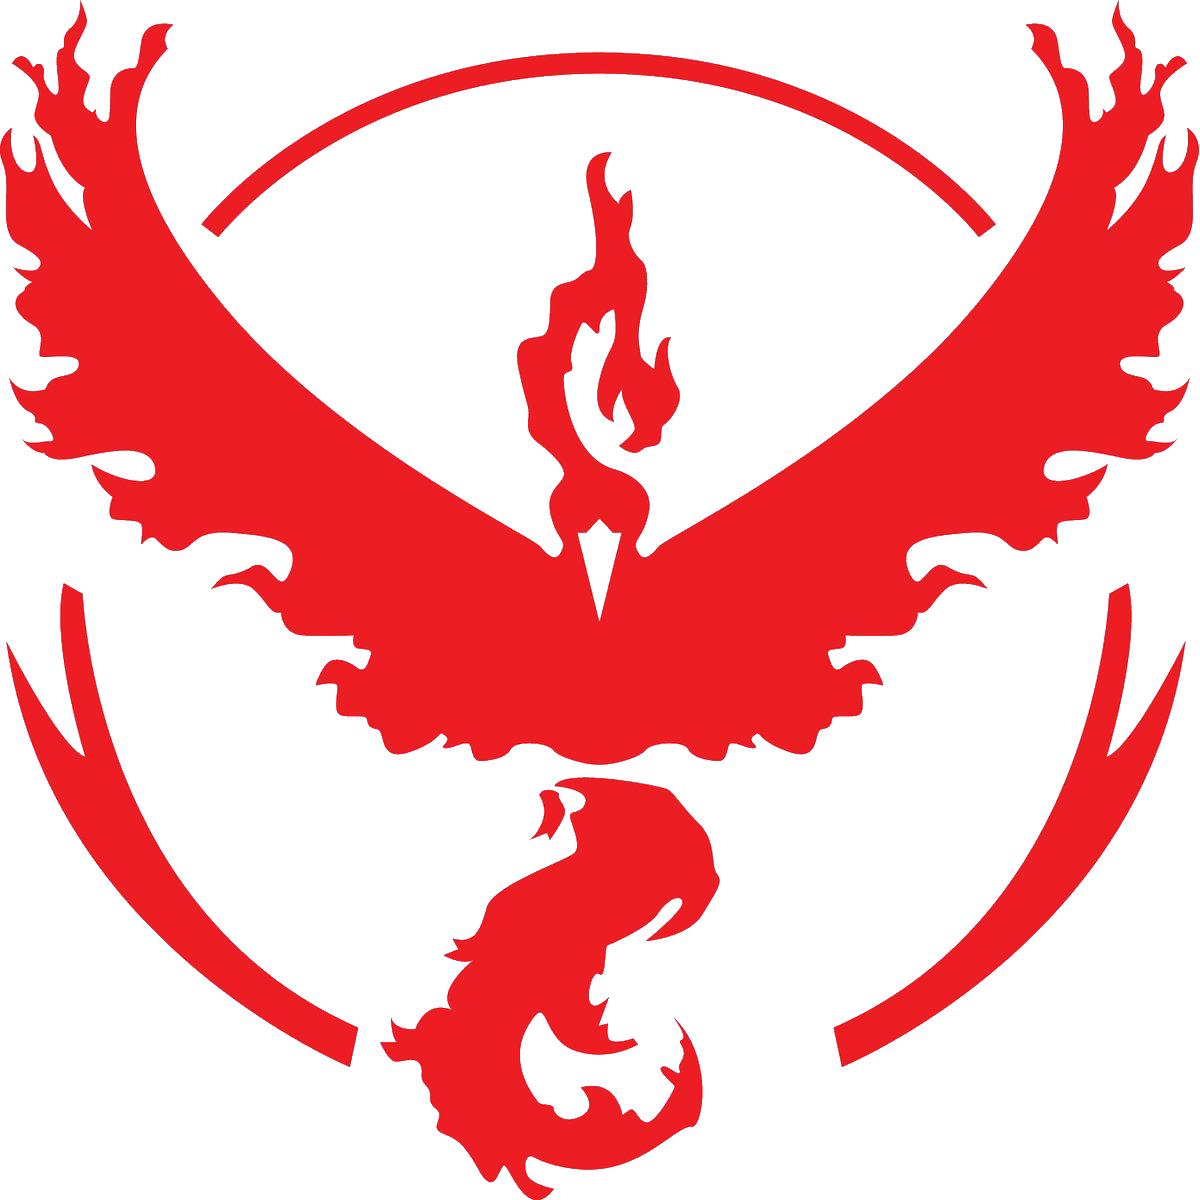 Team_Valor_emblem